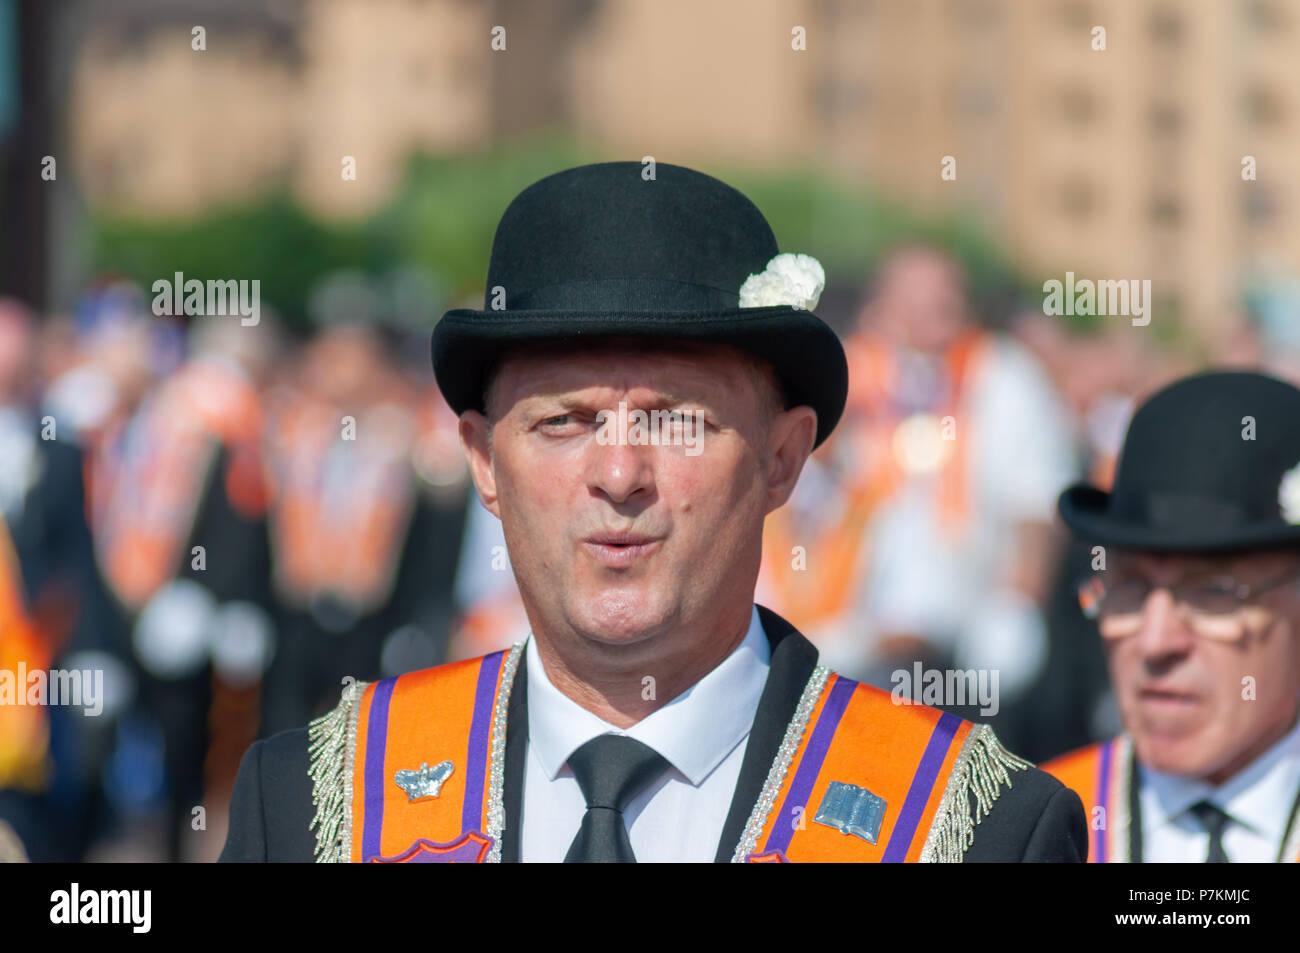 fa826fe971b A Man Wearing Bowler Hat Stock Photos   A Man Wearing Bowler Hat ...